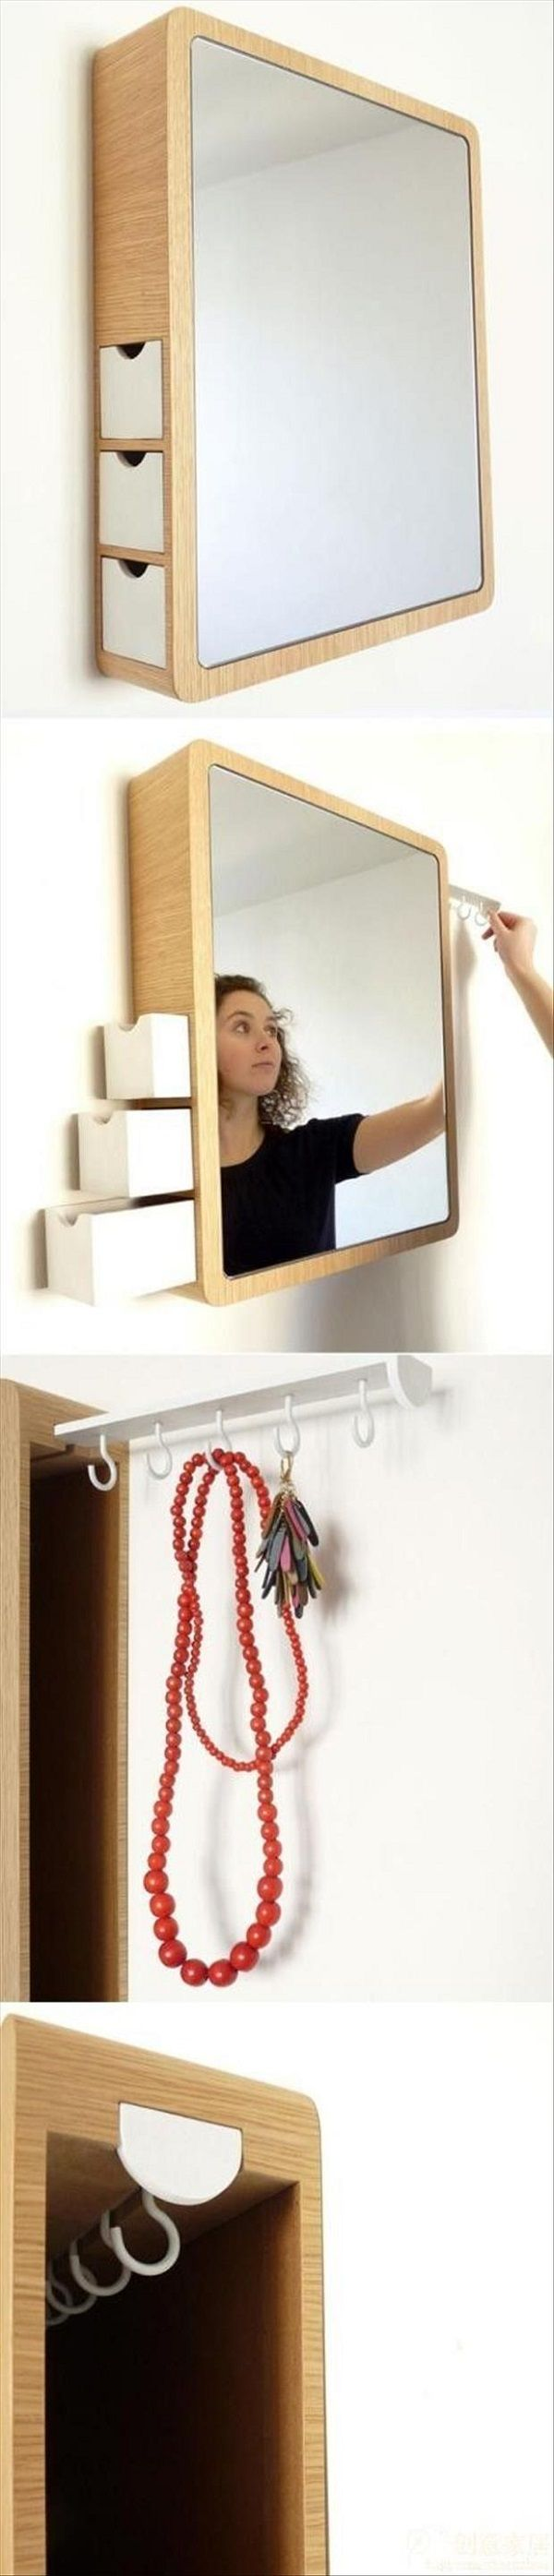 precious storage mirror - Genial